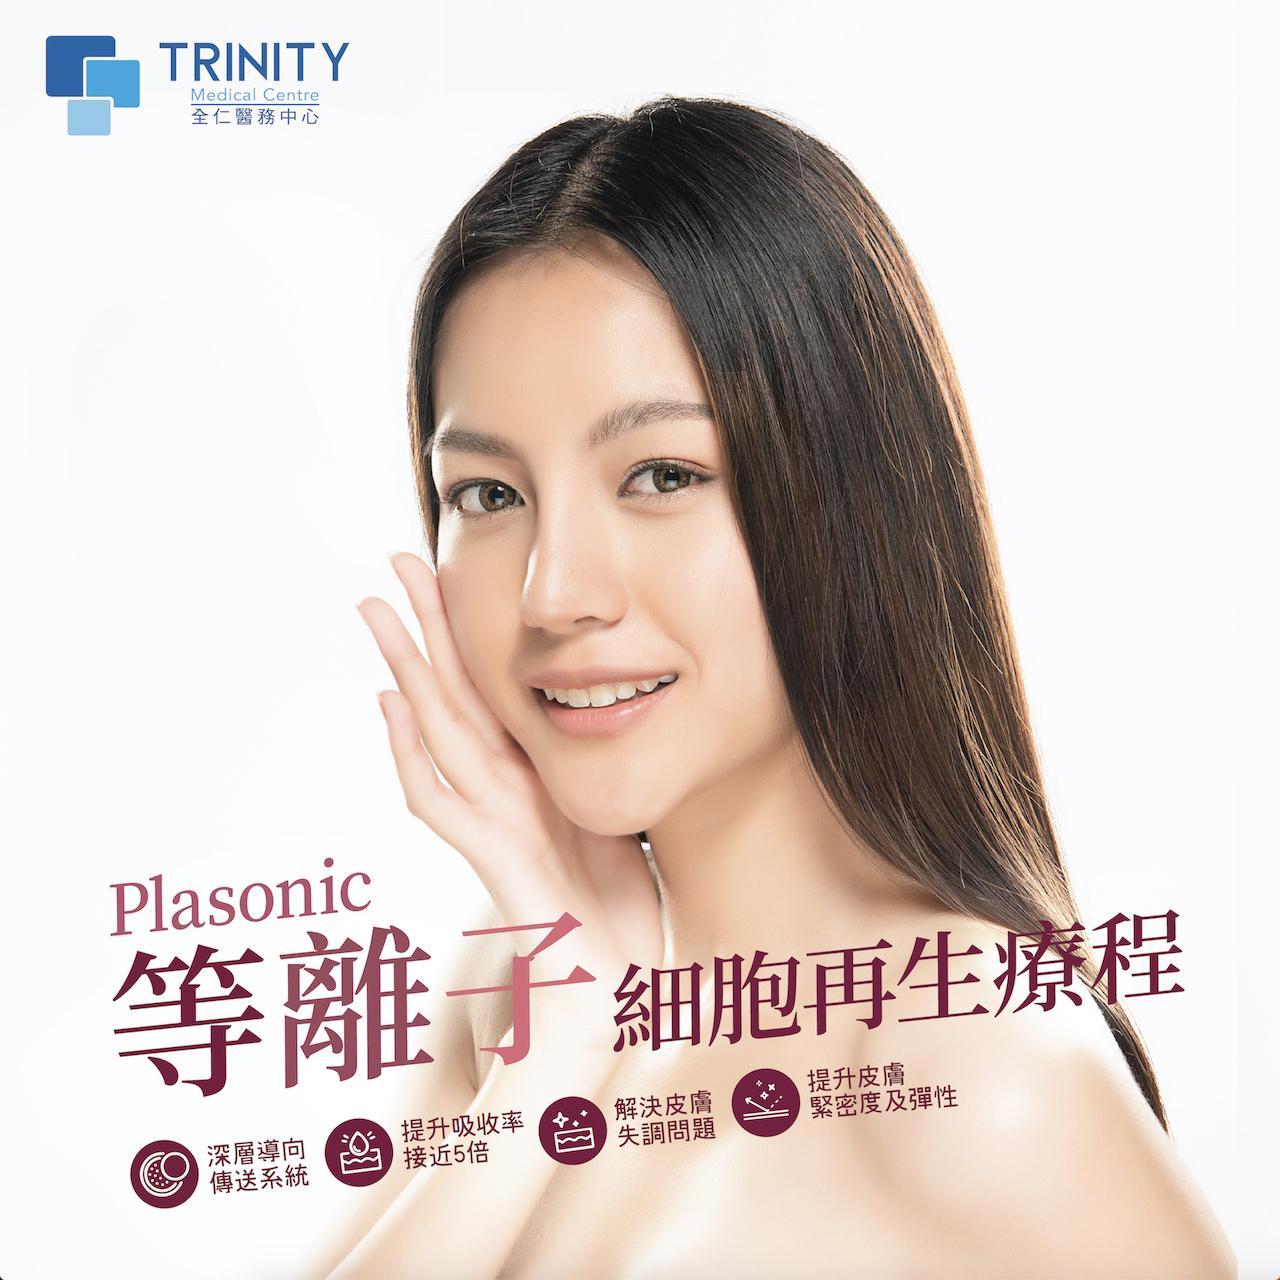 Plasonic Treatment